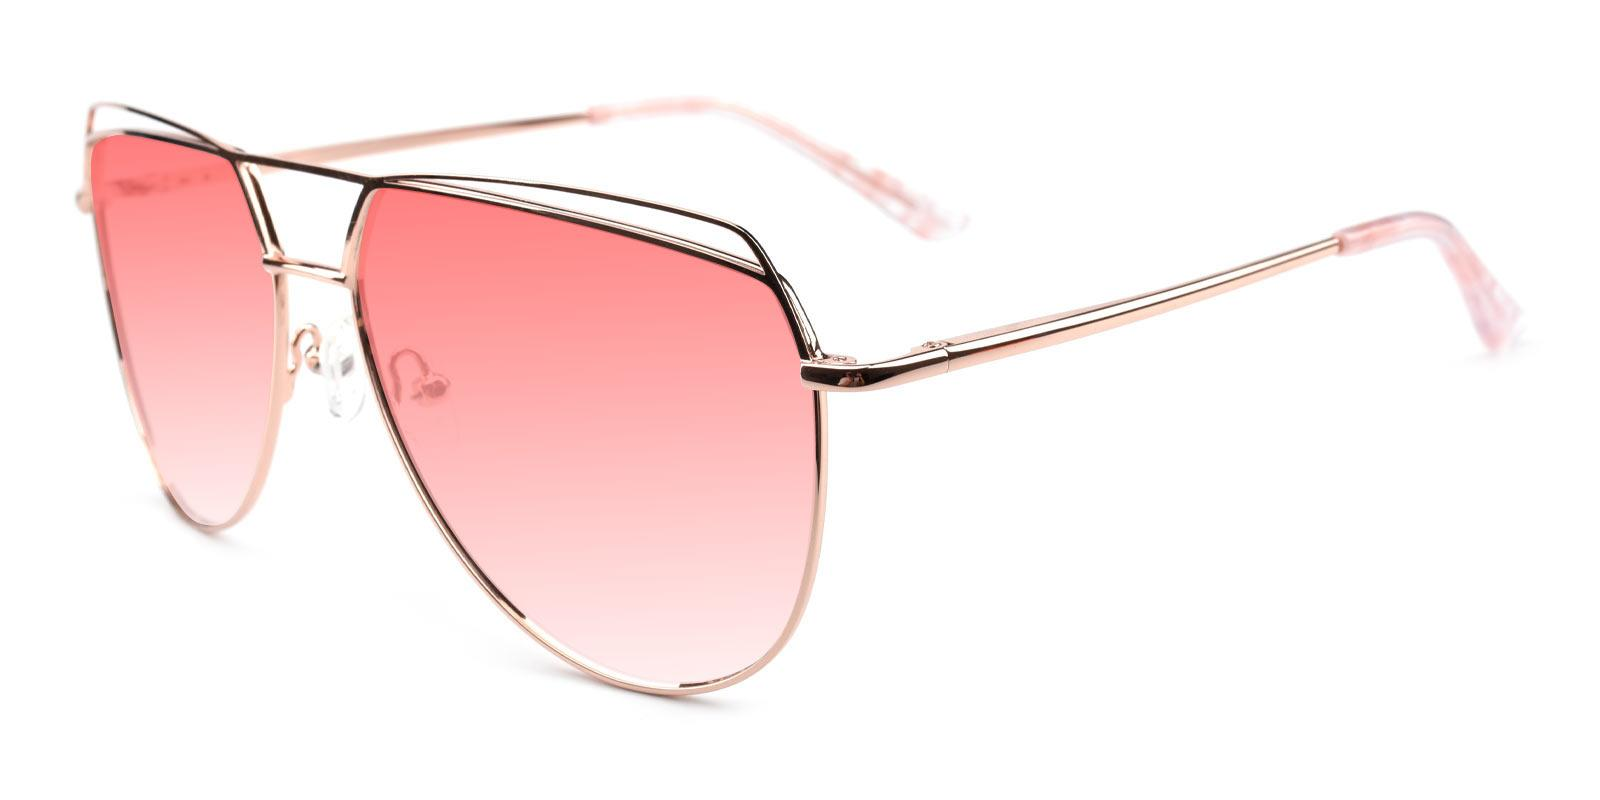 Acto-Pink-Aviator-Metal-Sunglasses-additional1